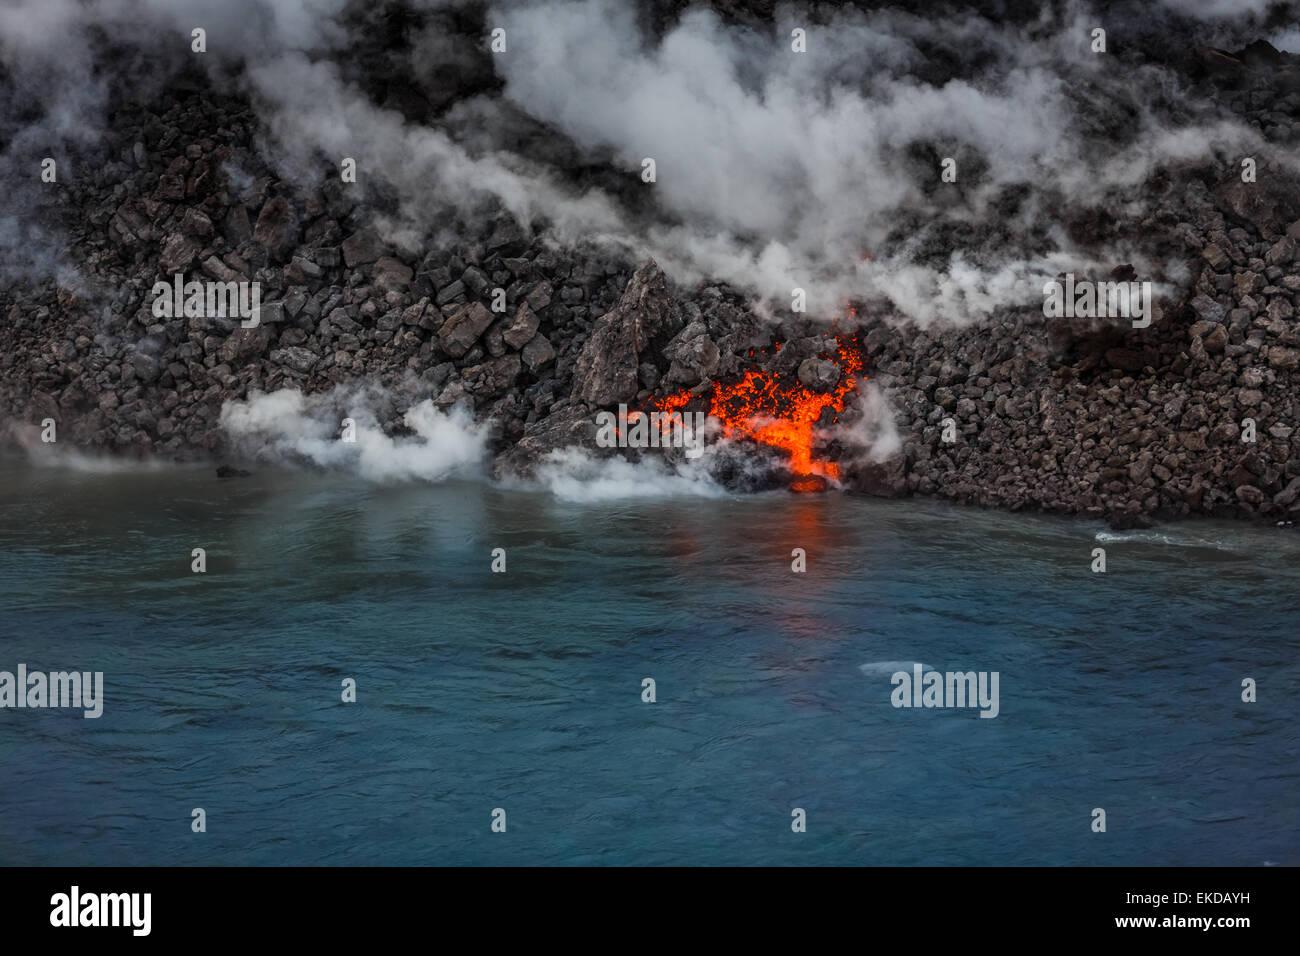 Volcano Eruption at the Holuhraun Fissure near the Bardarbunga Volcano, Iceland. - Stock Image